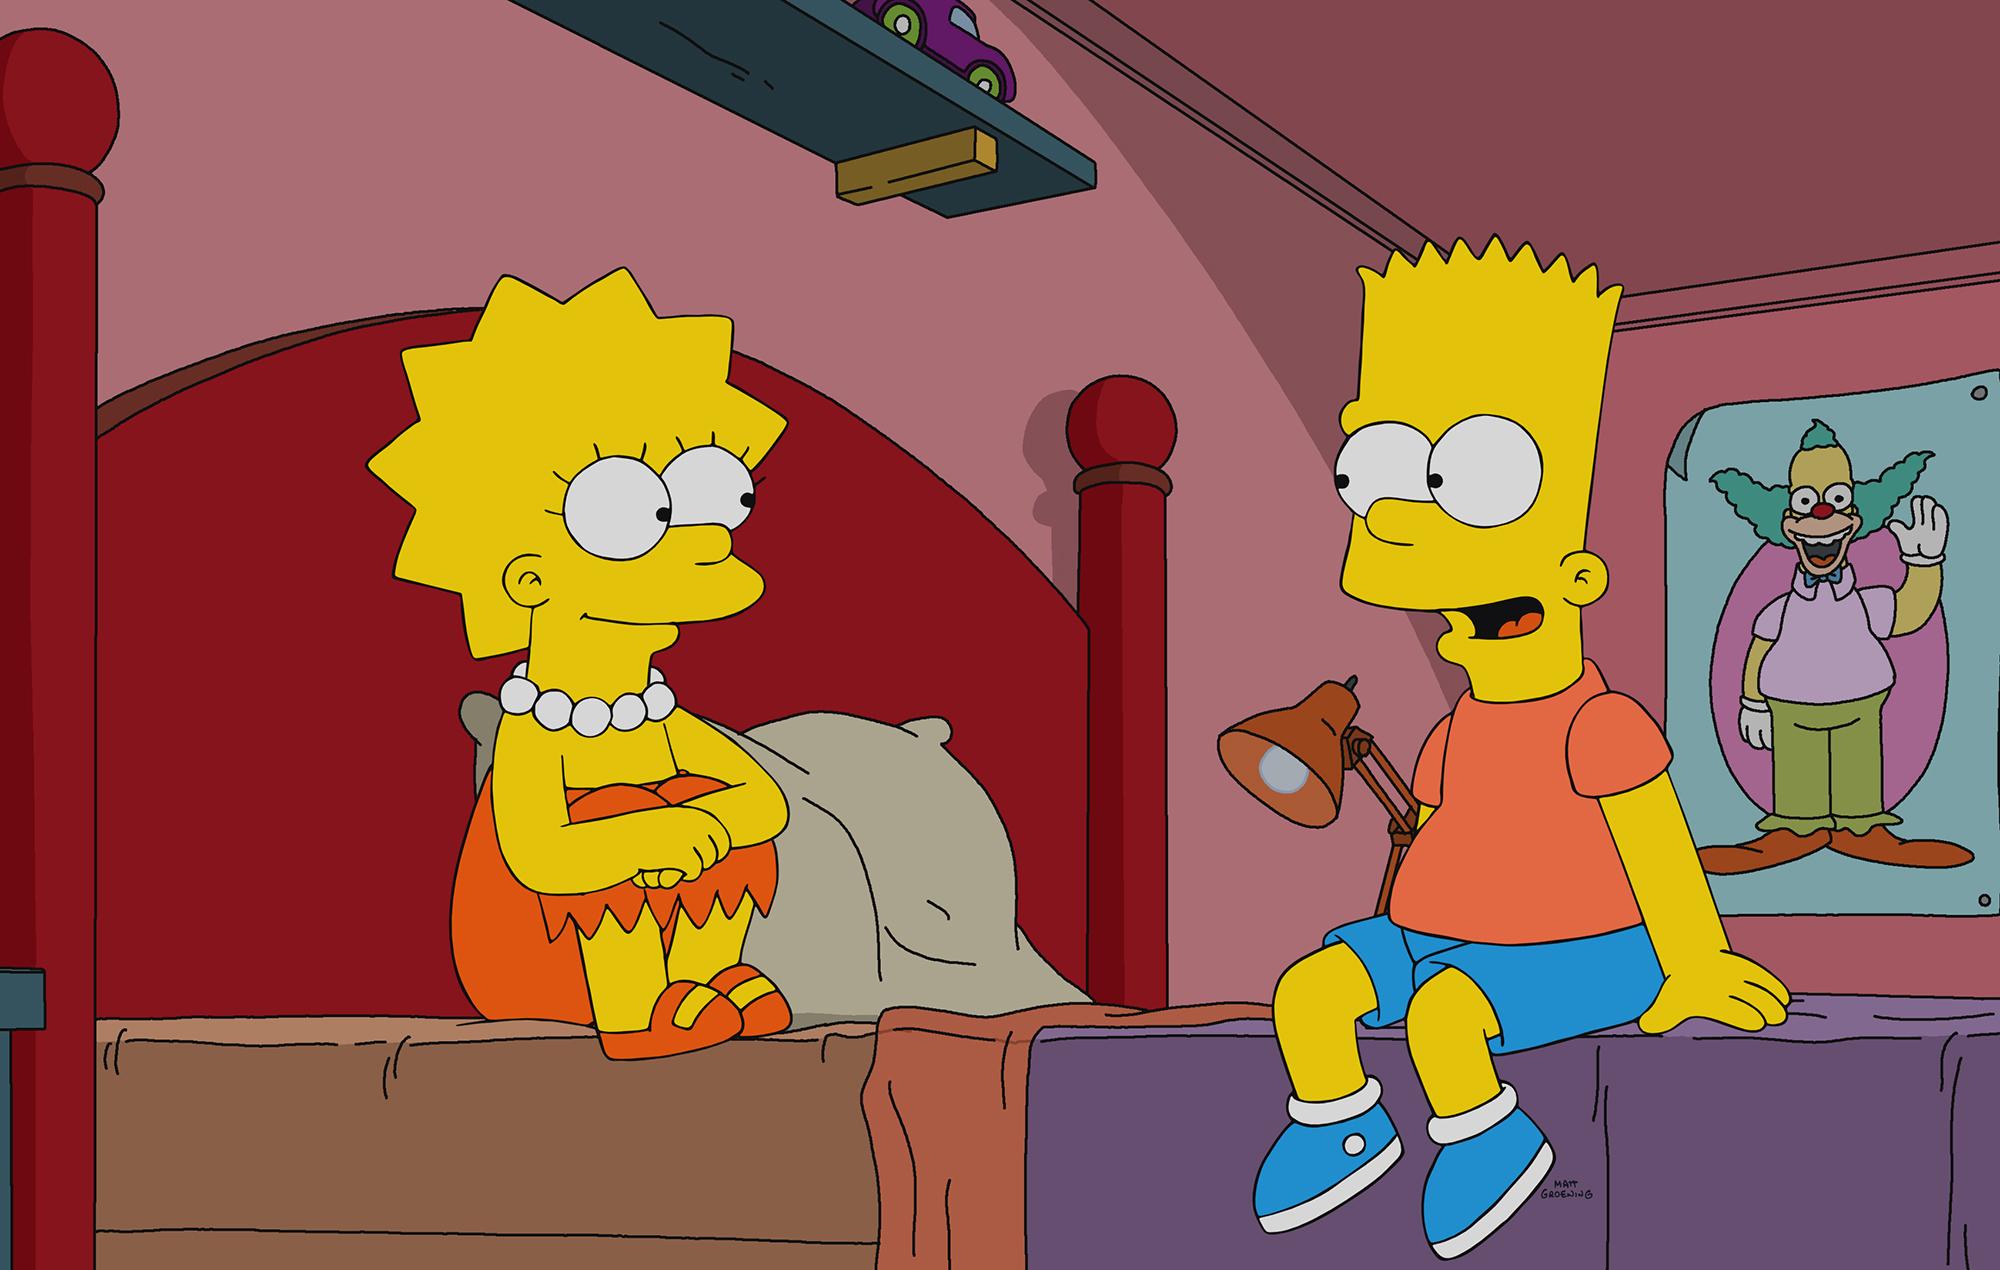 'The Simpsons' season 32 episode 7 recap: Lisa is the voice of wokeness